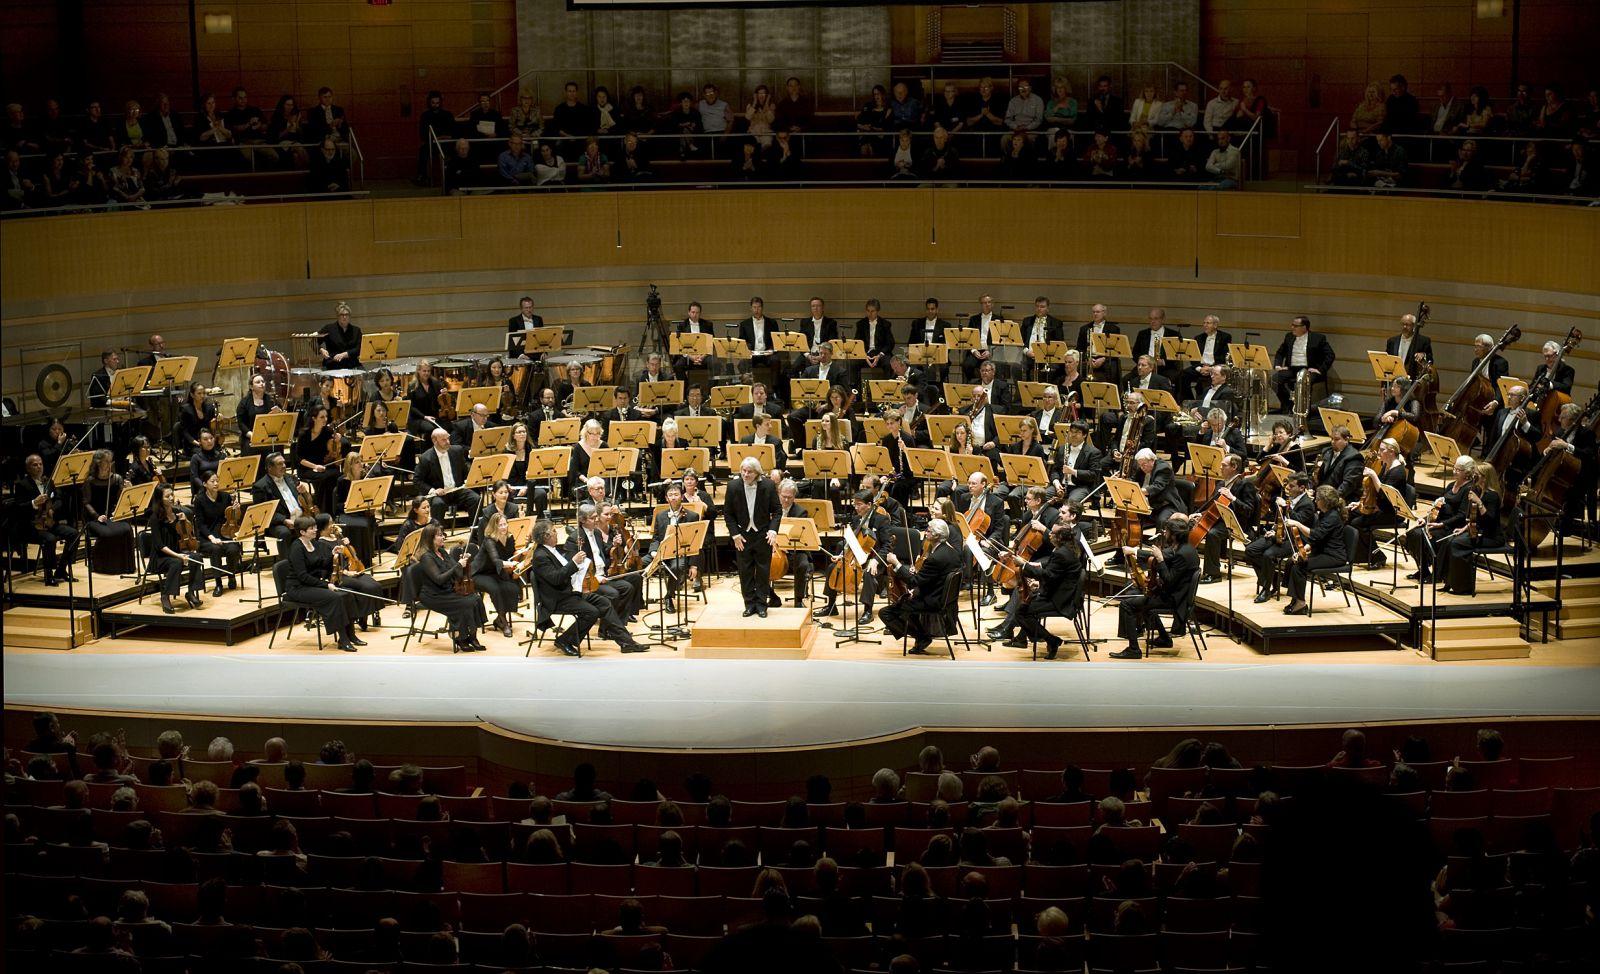 Orchestra_2_FullSize